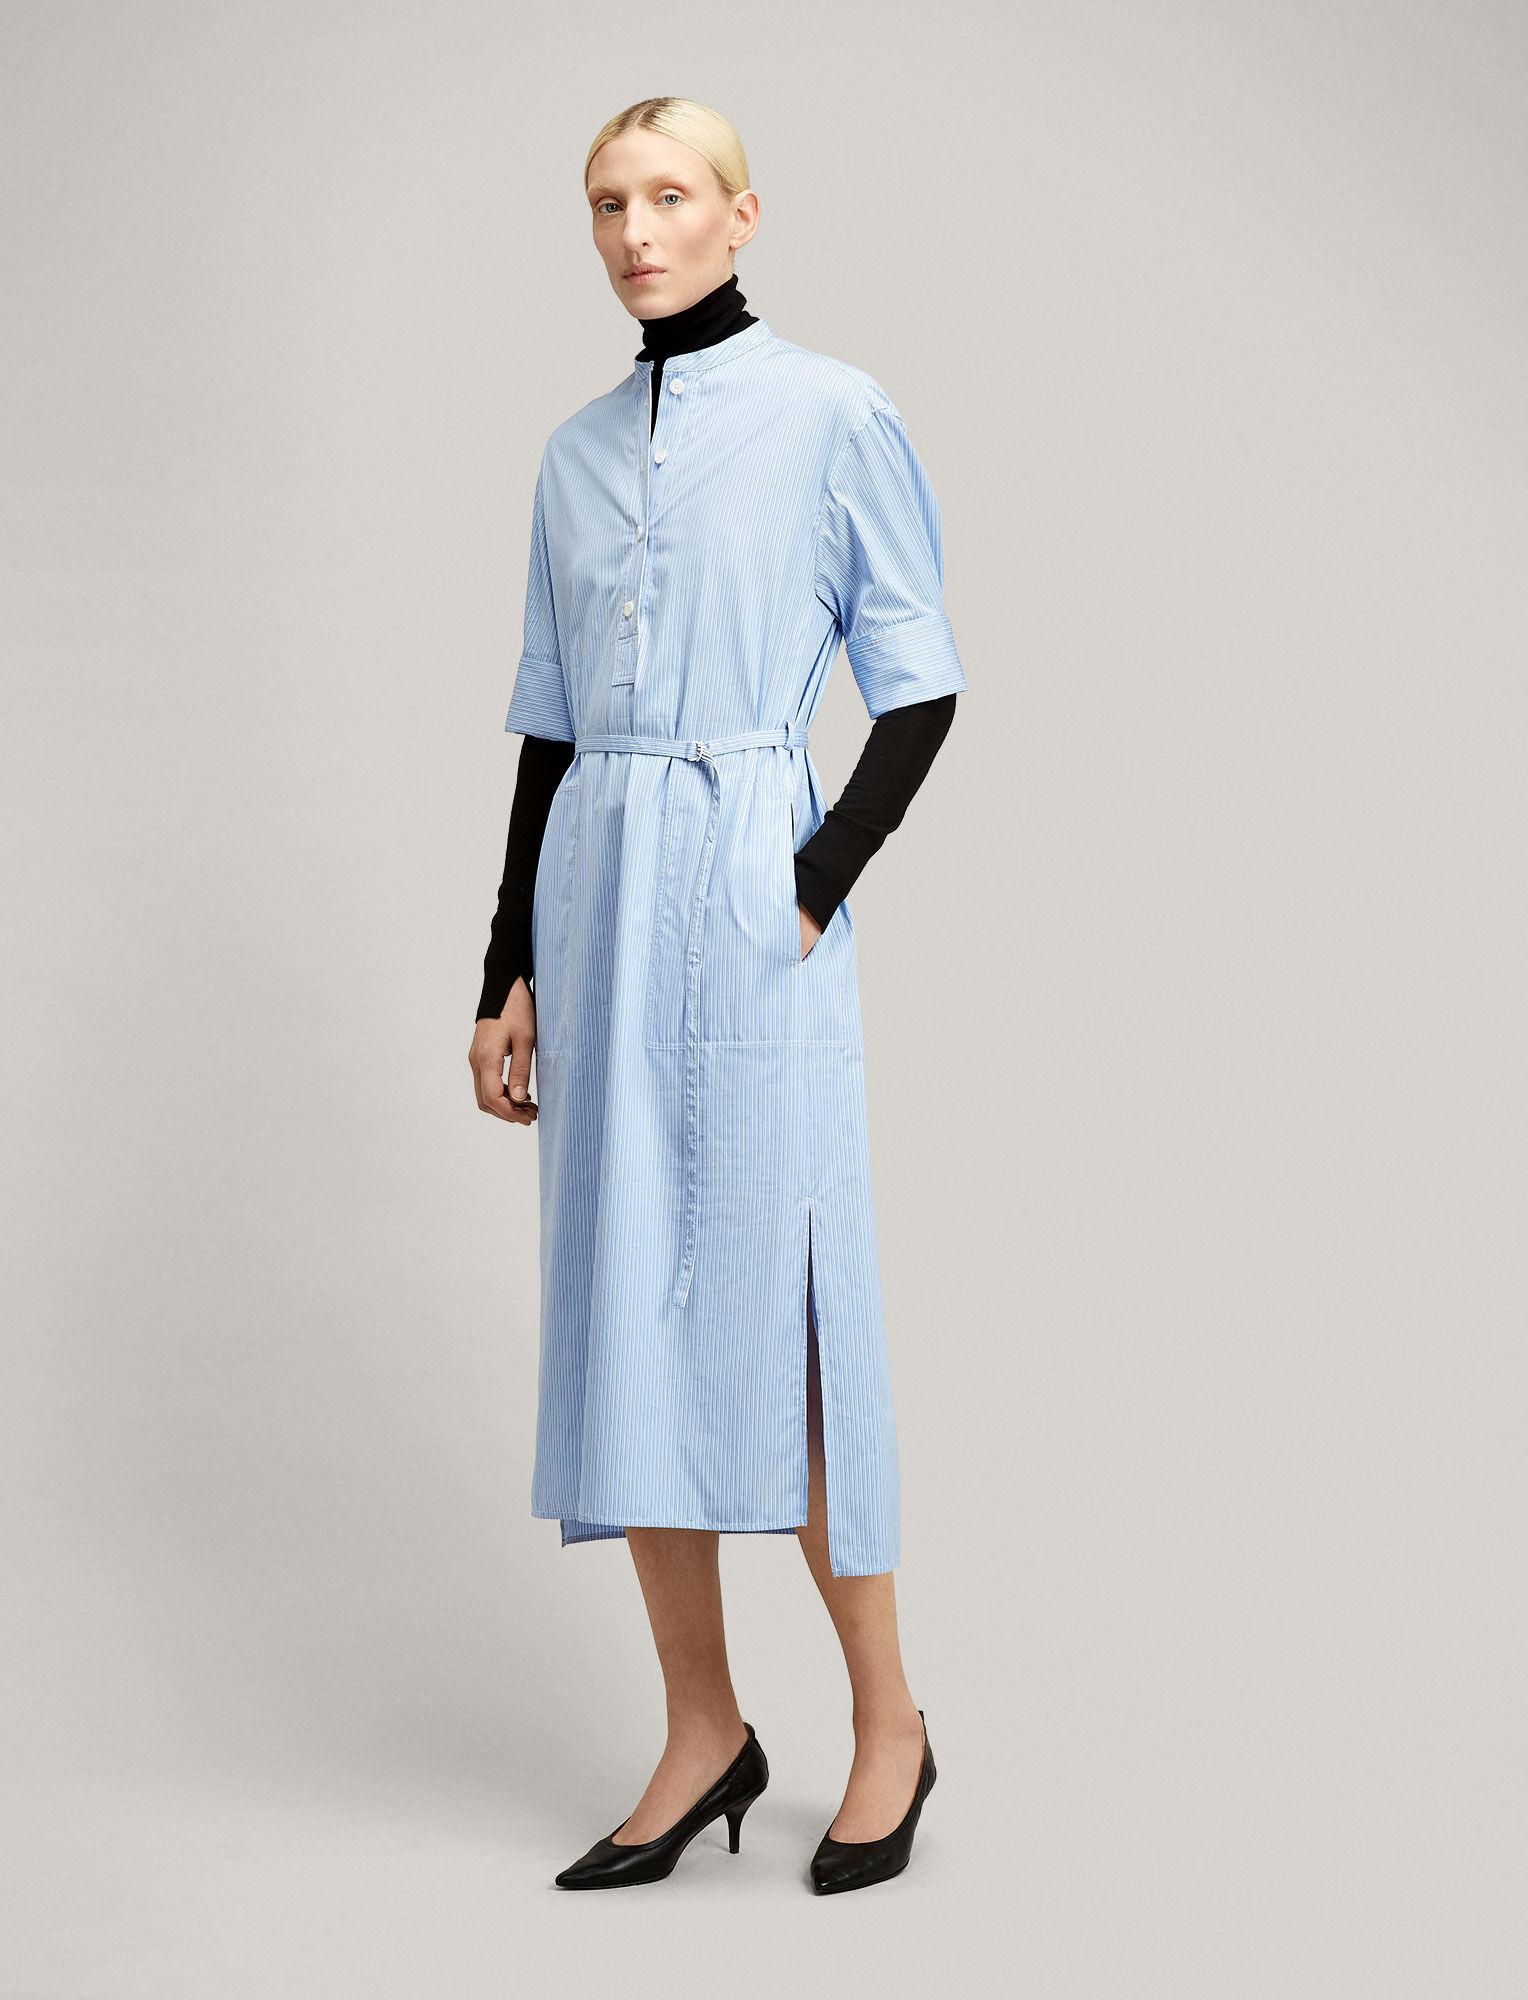 Joseph, Barker Pinstripe Mix Dress, in BLUE